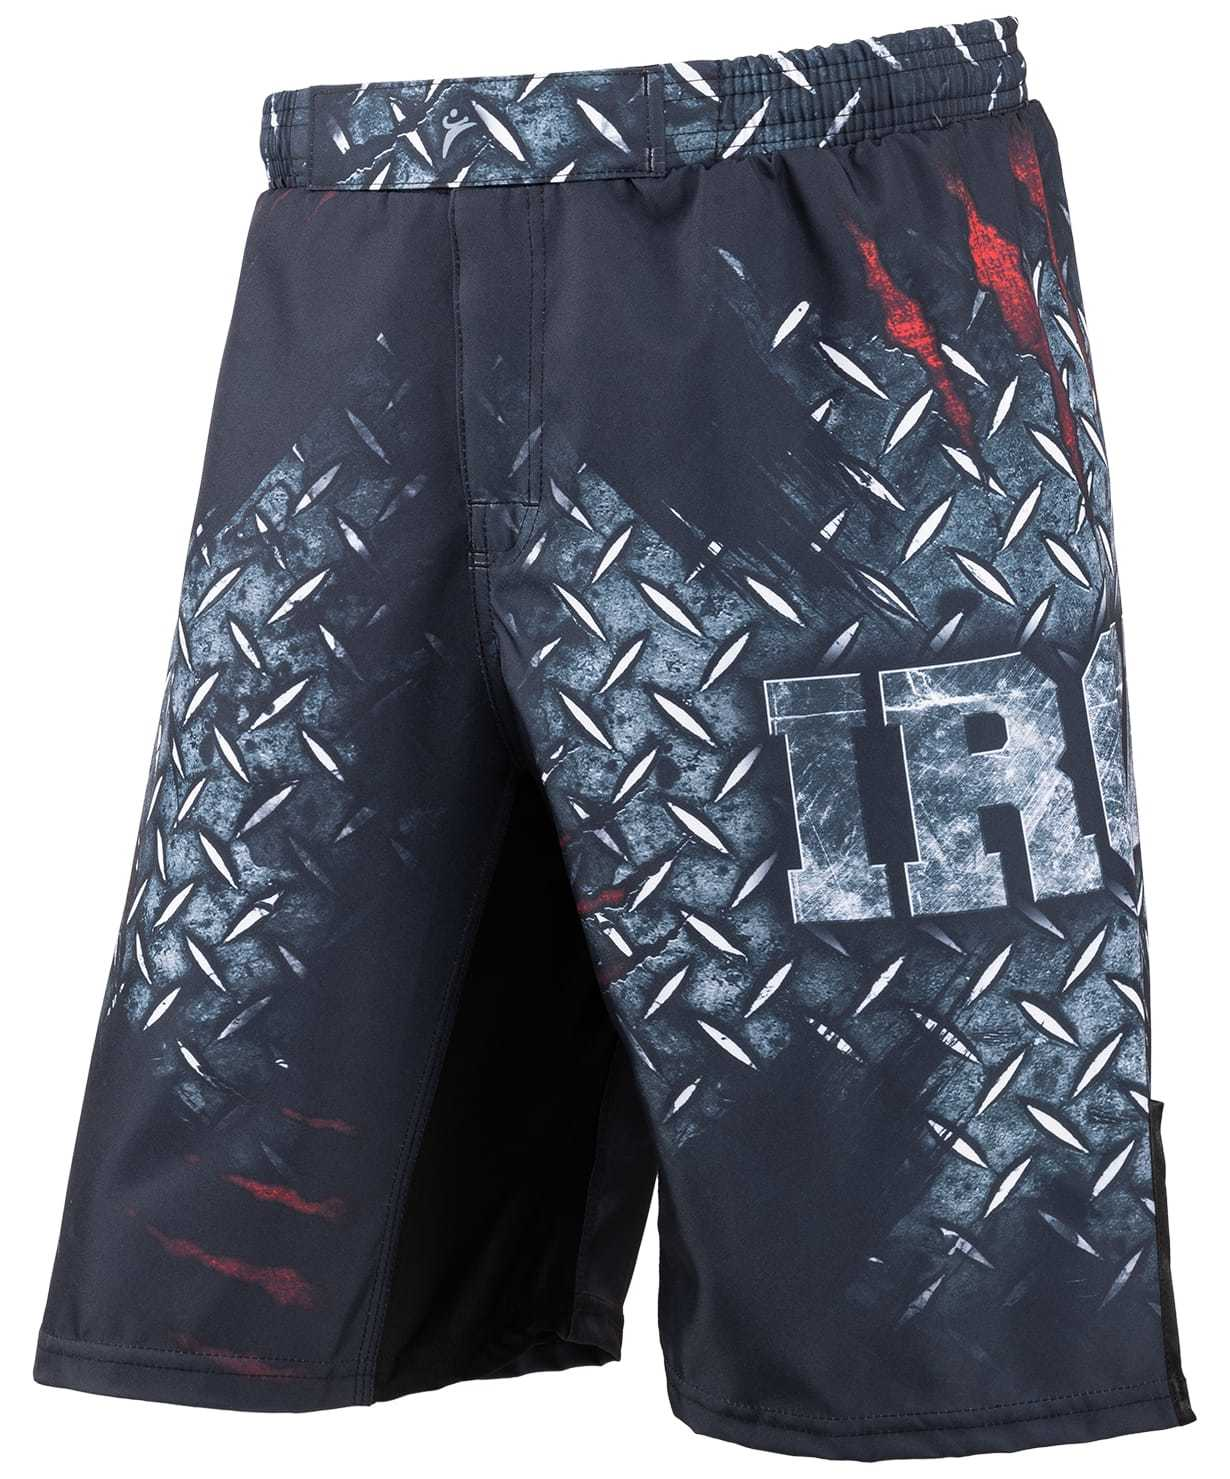 Рашгарды и шорты Шорты для MMA Iron, взрослые 66f5bbc4c3c2528e742cfc1dd74b0fcb.jpg